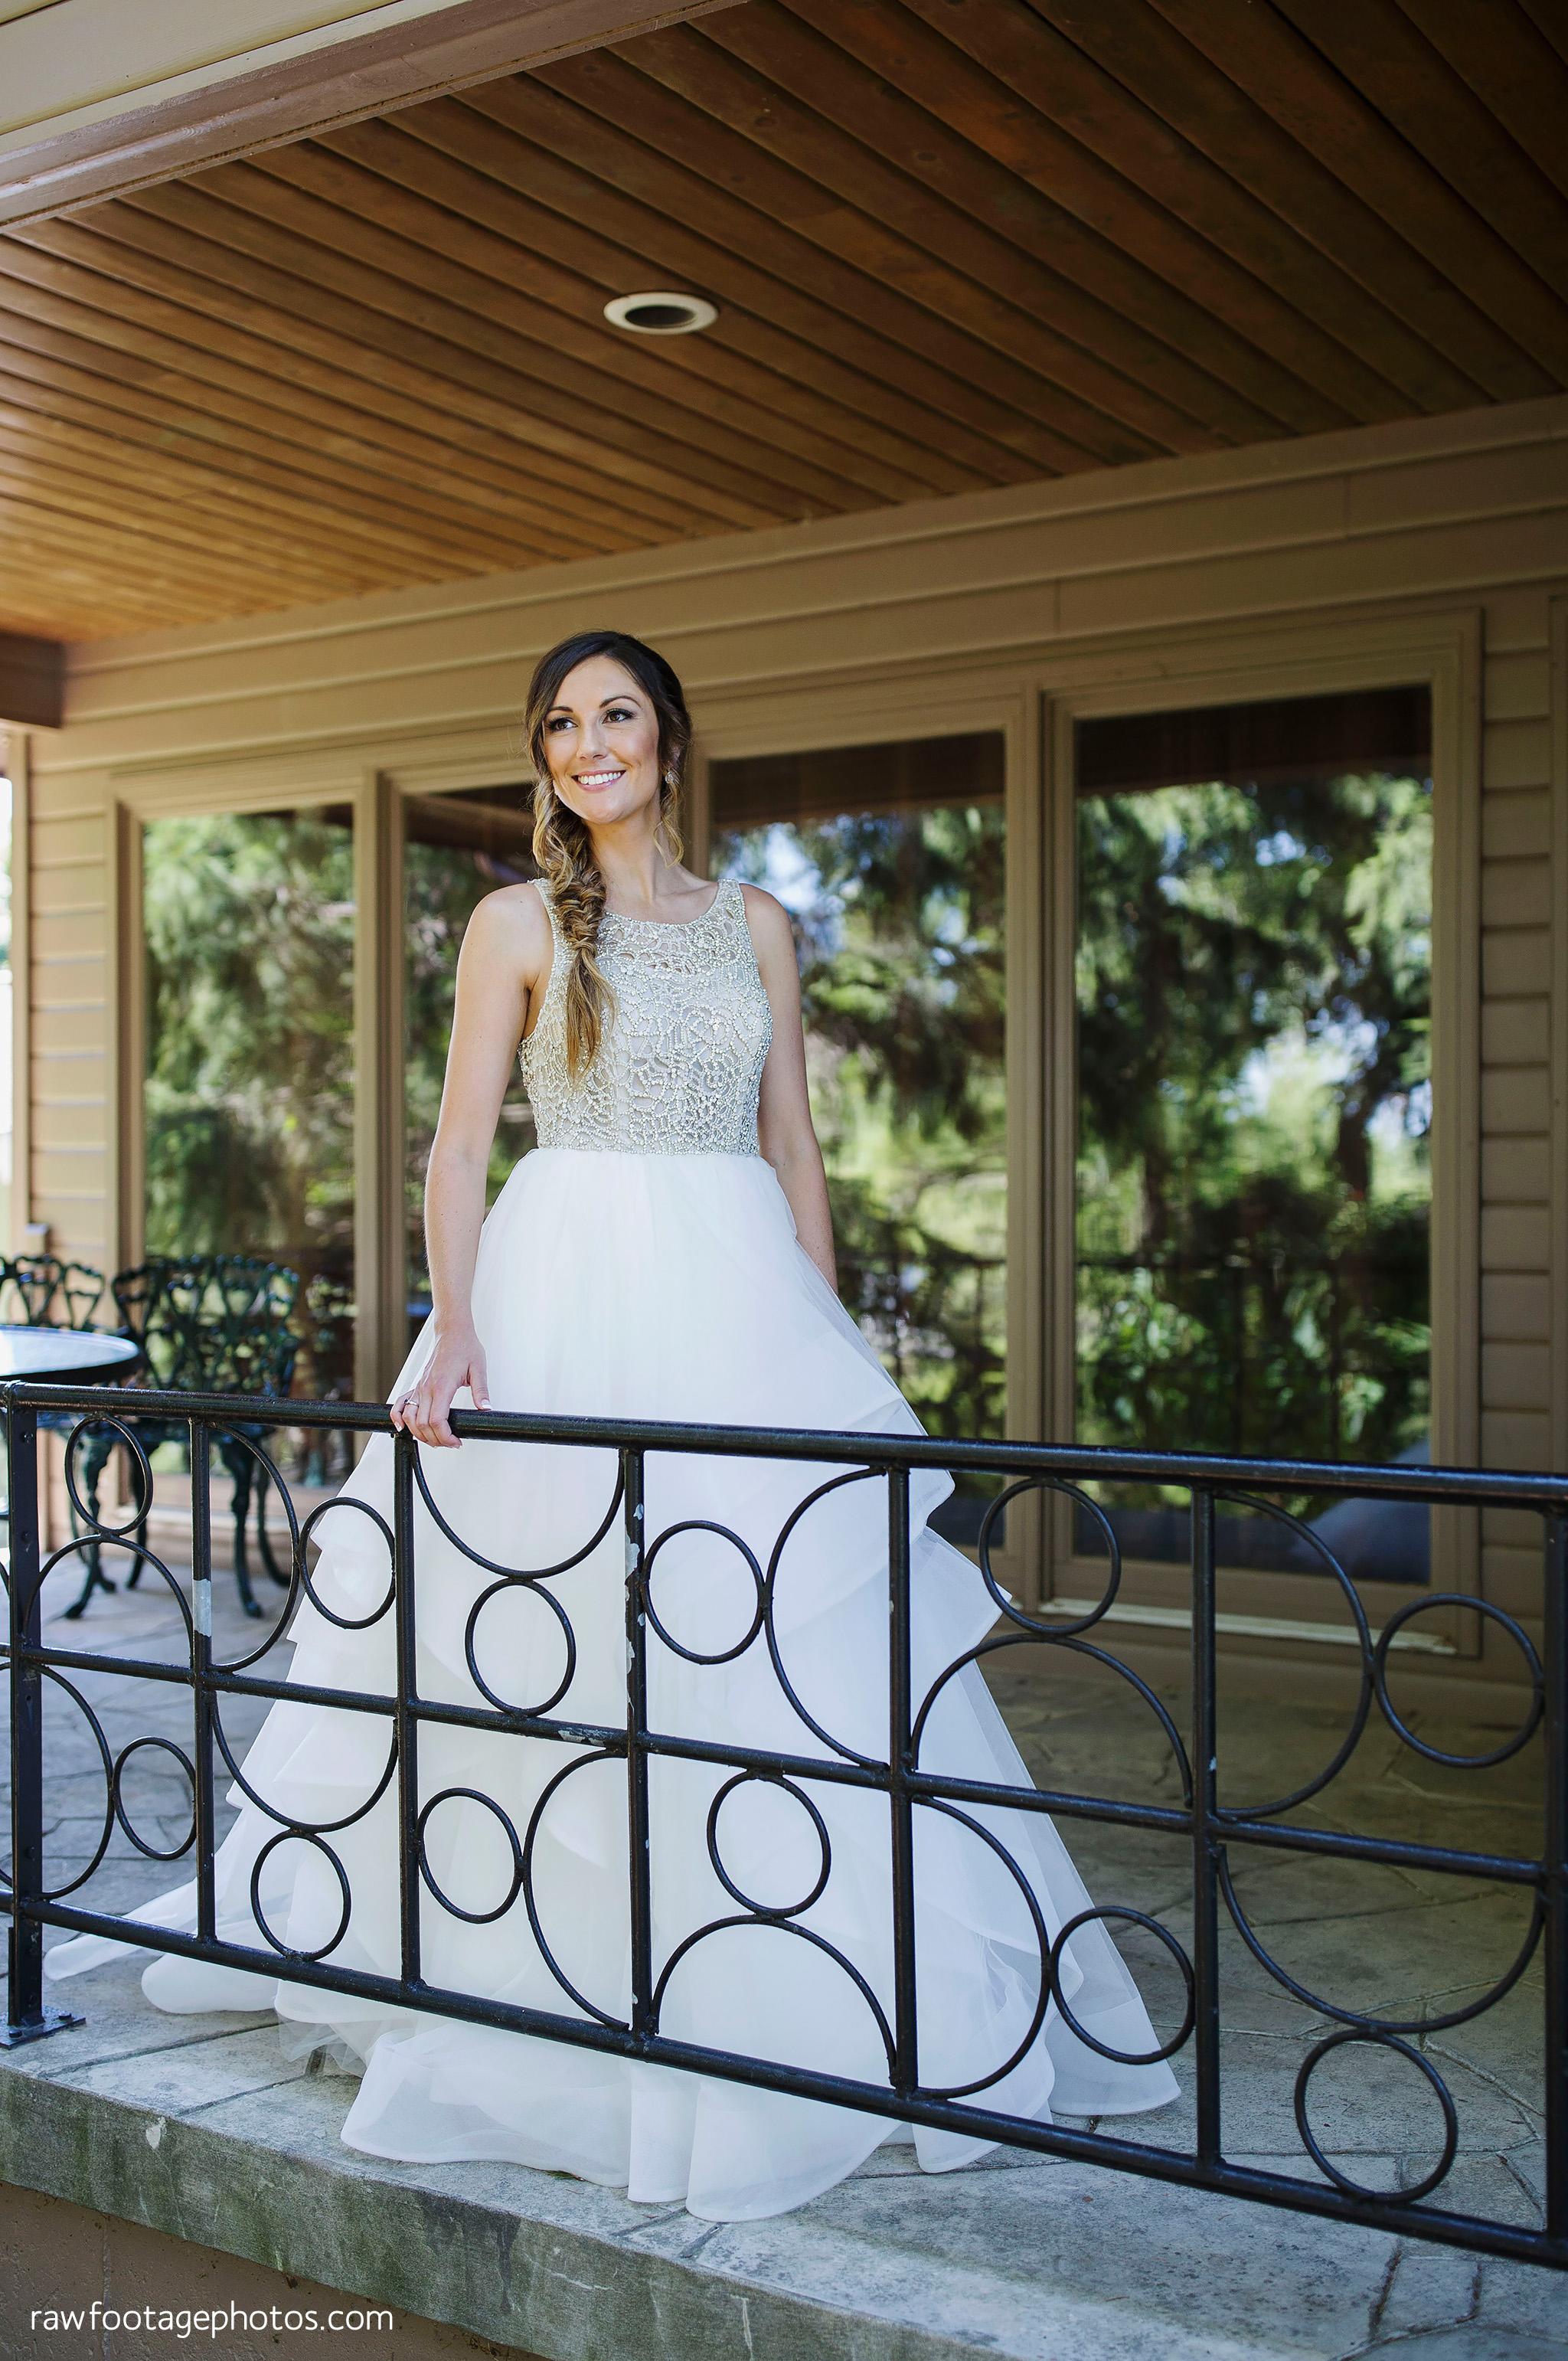 london_ontario_wedding_photographer-grand_bend_wedding_photographer-oakwood_resort_wedding-beach_wedding-sunset_wedding-raw_footage_photography028.jpg